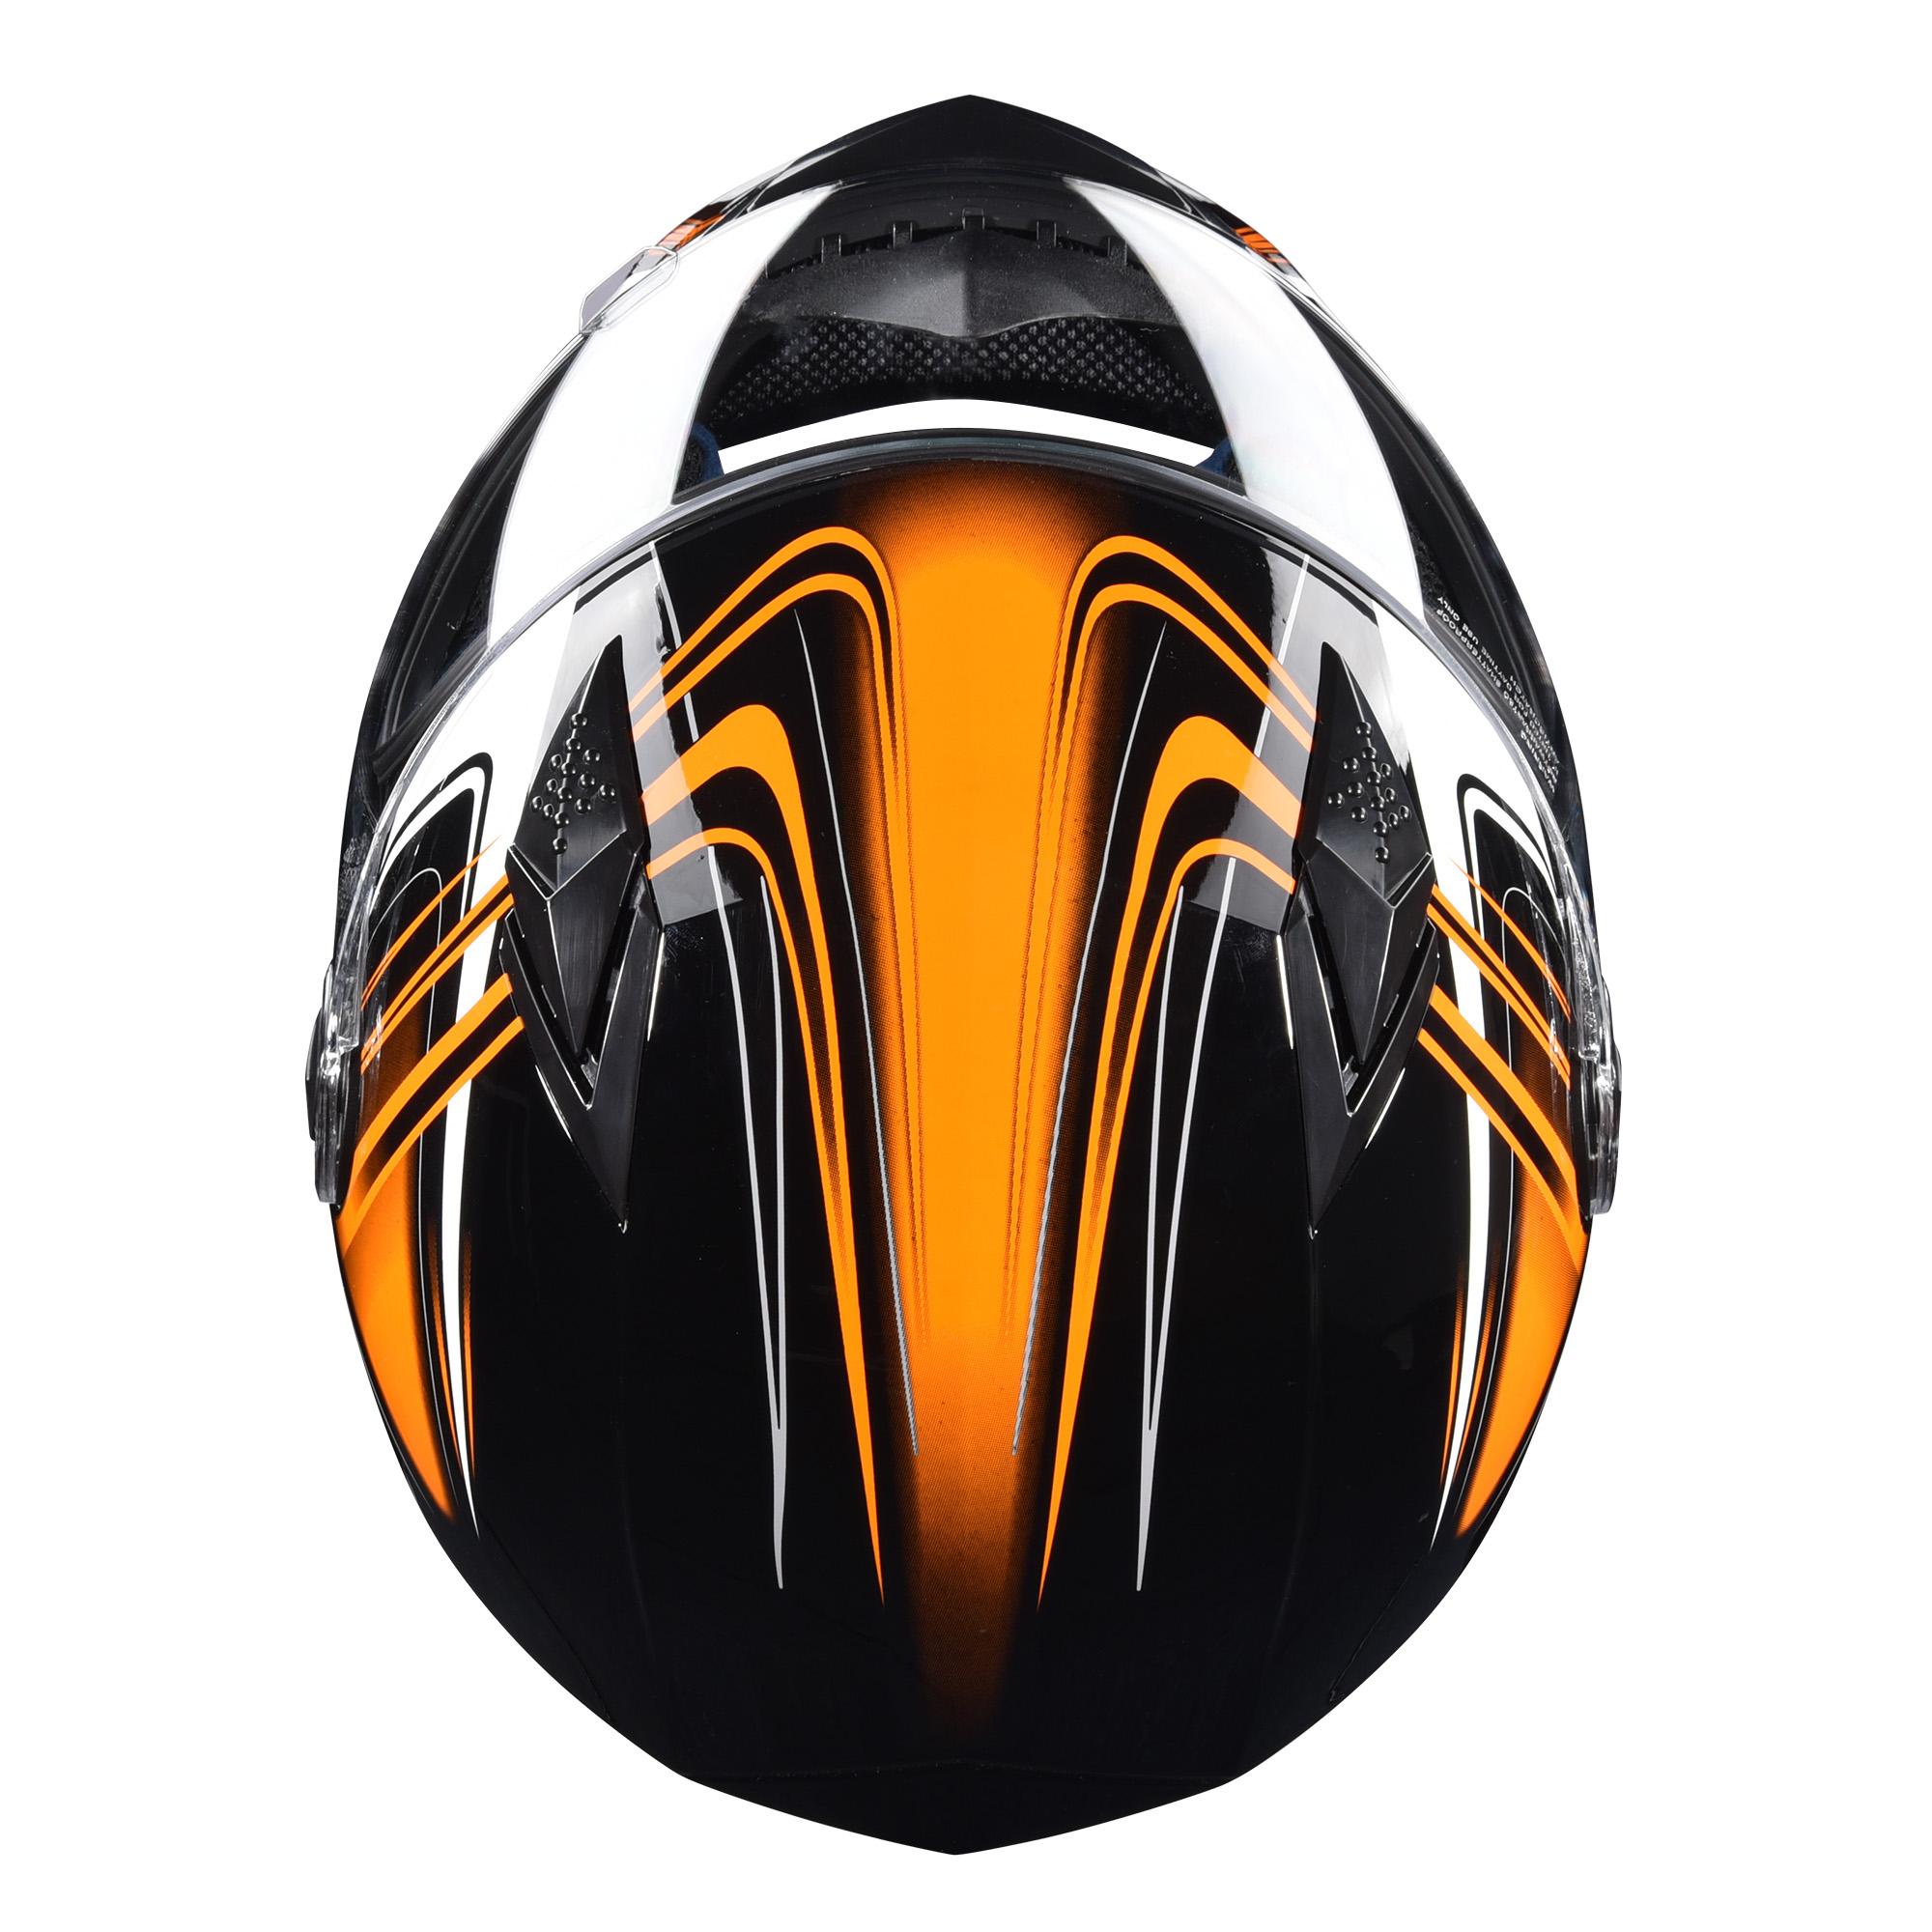 miniature 78 - AHR K12 Full Face Motorcycle Helmet DOT Air Vents Clear Visor Racing S M L XL